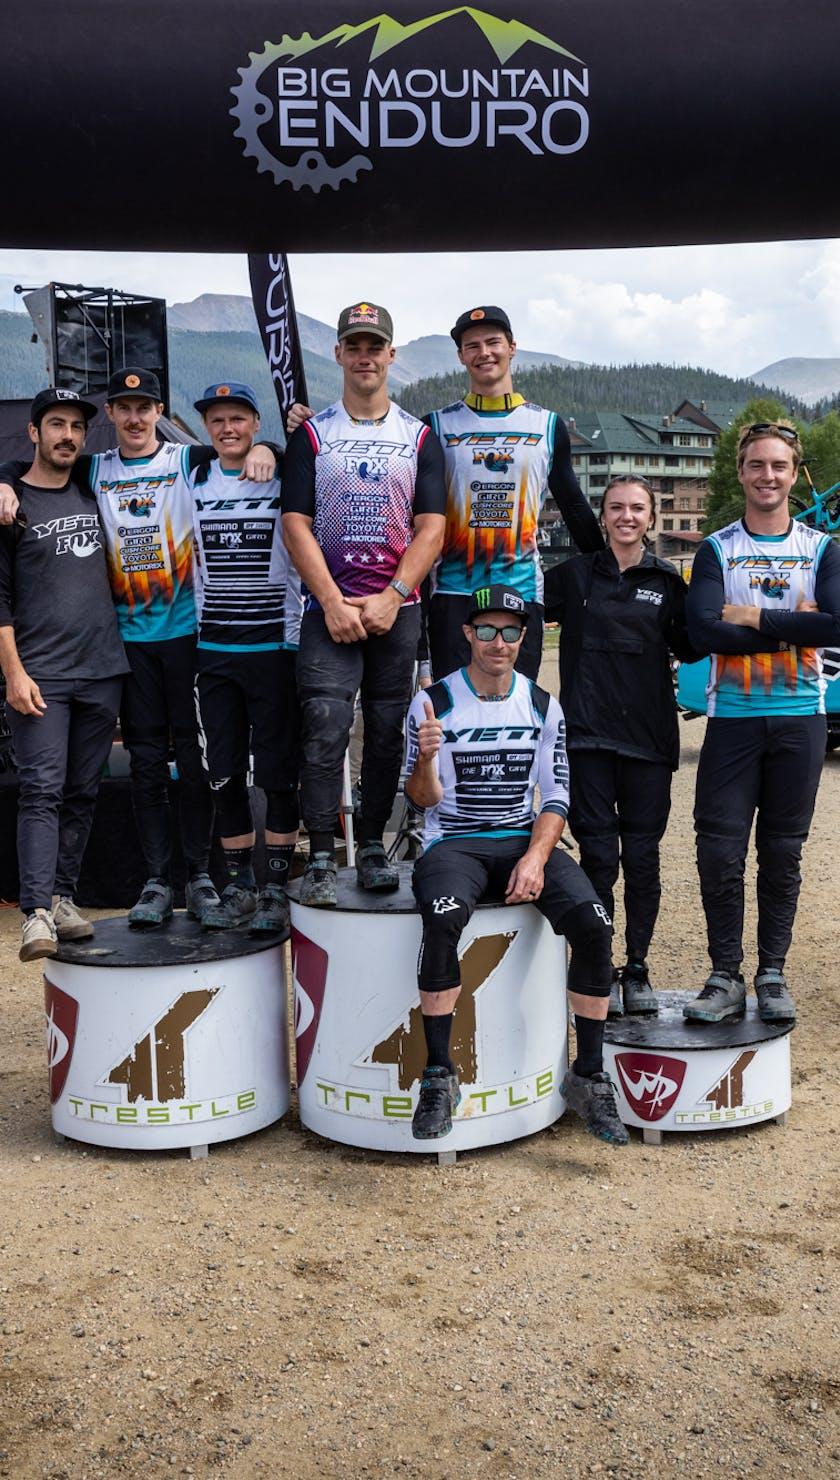 BME 21 Winter Park - The Whole Team